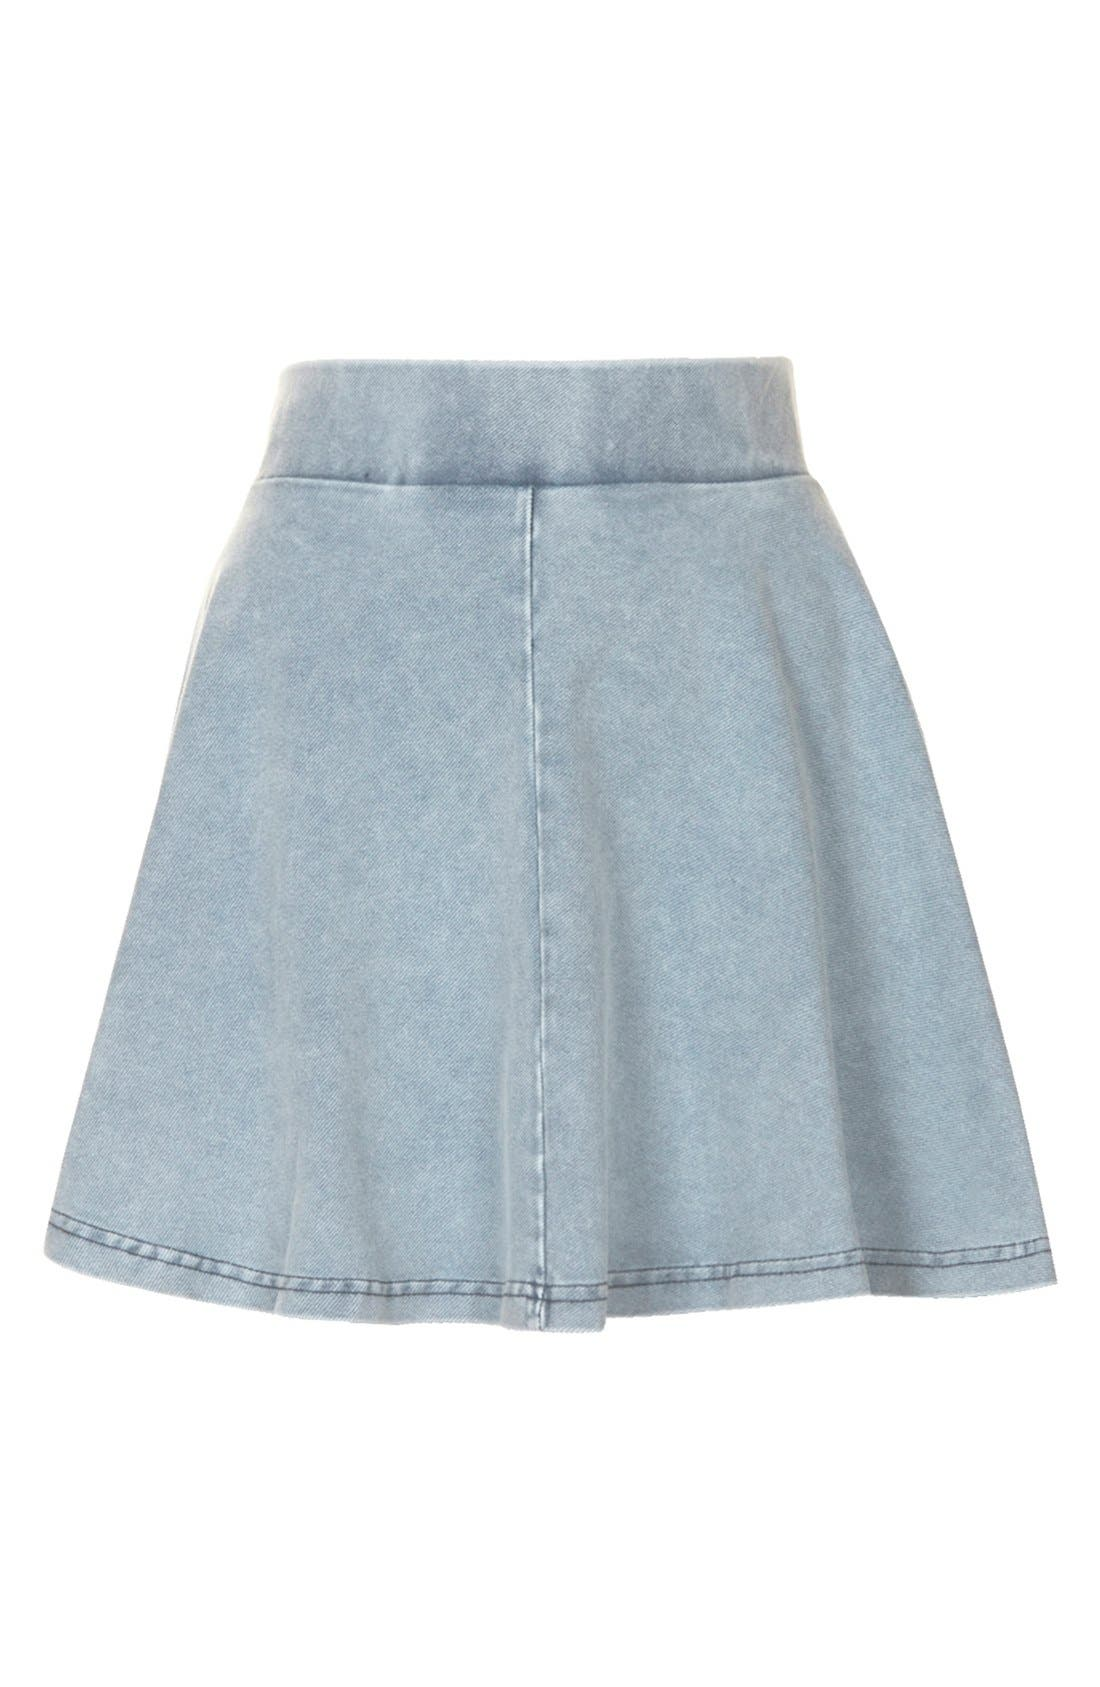 Alternate Image 3  - Topshop 'Andie' Denim Skater Skirt (Petite)